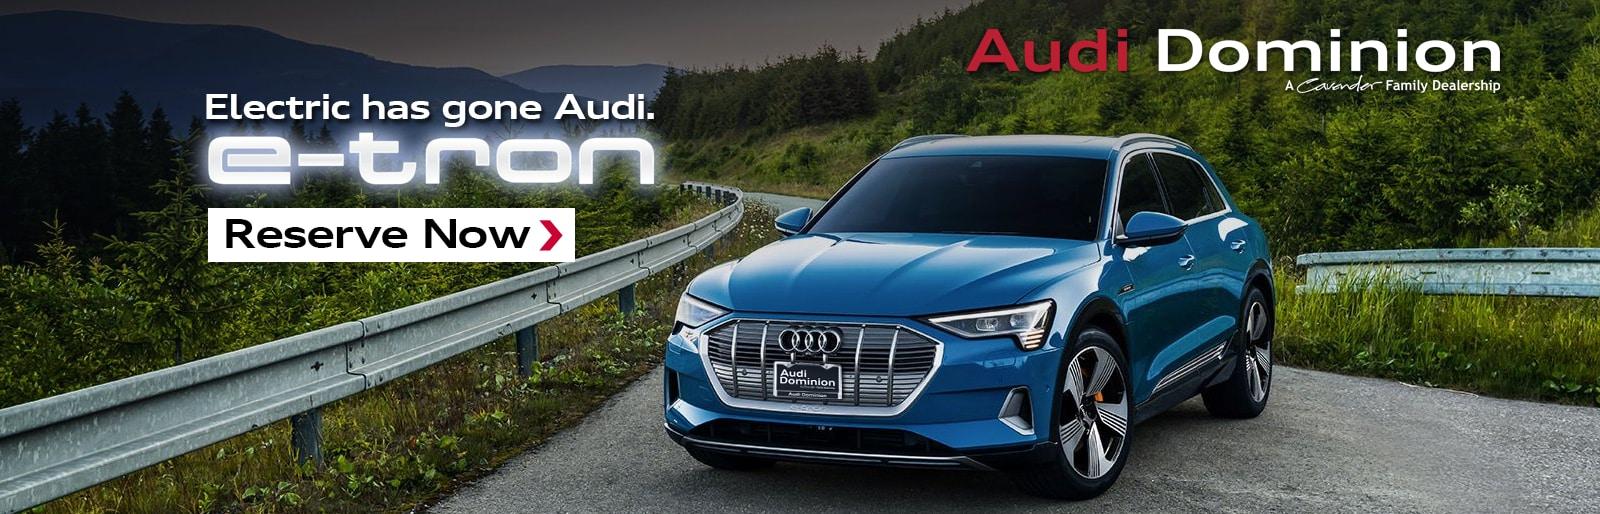 New Audi Used Car Dealer In San Antonio TX Audi Dominion - Audi car dealership